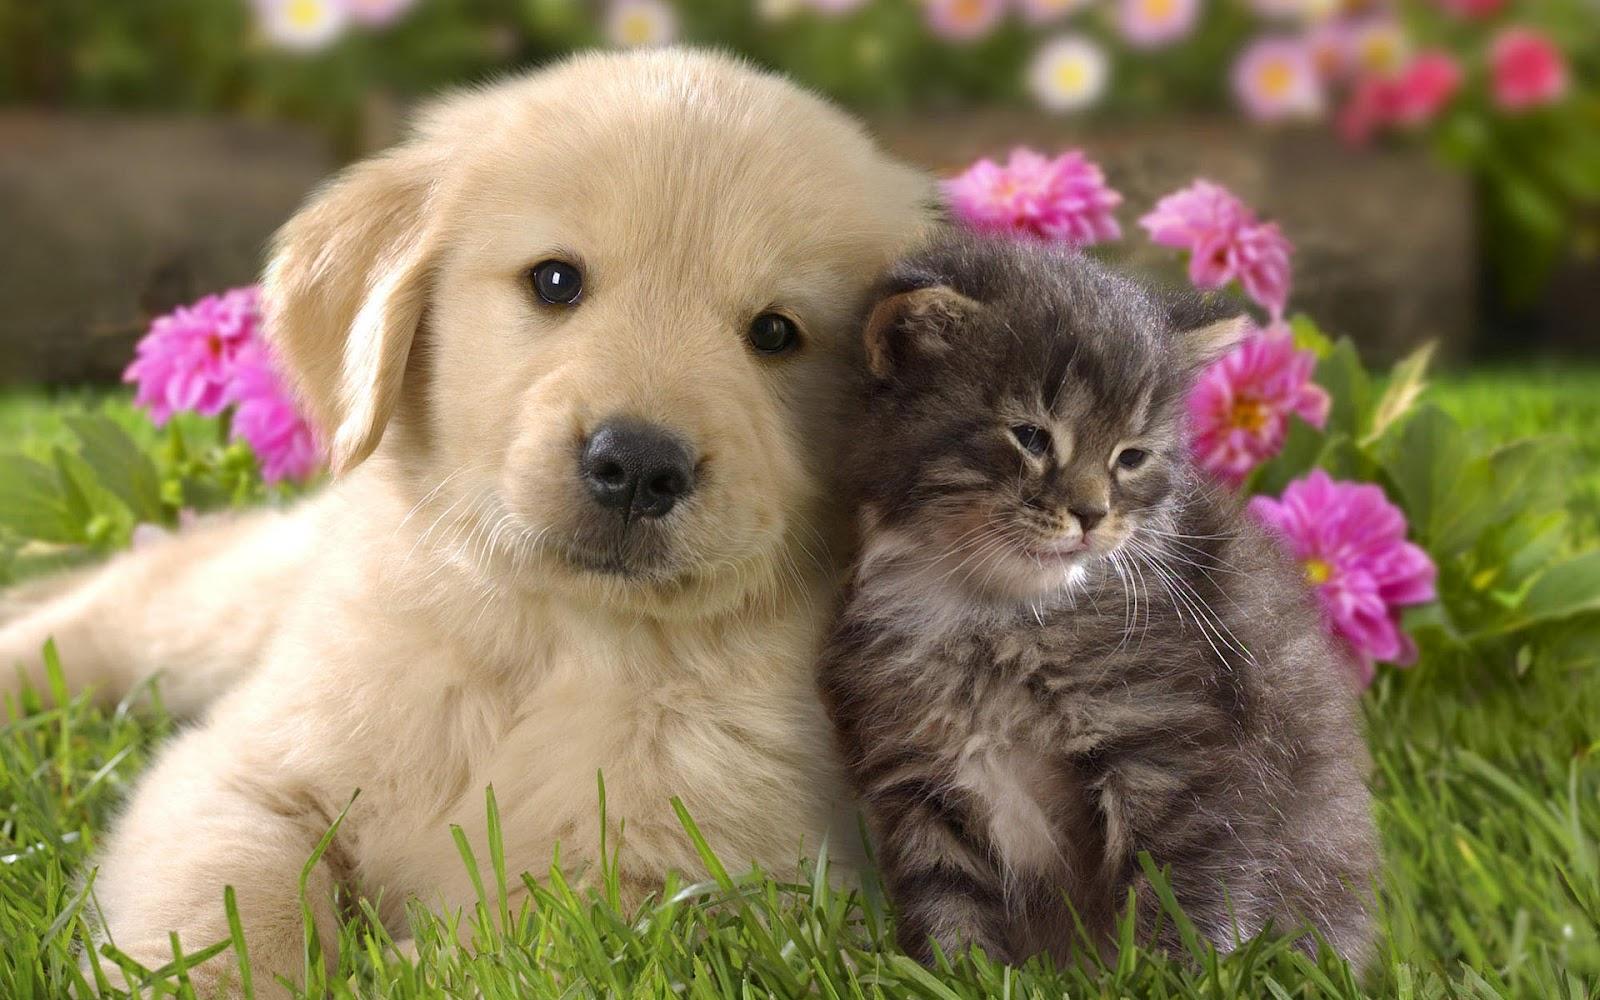 Cute cat and dog cuddling wallpaper 1600x1000